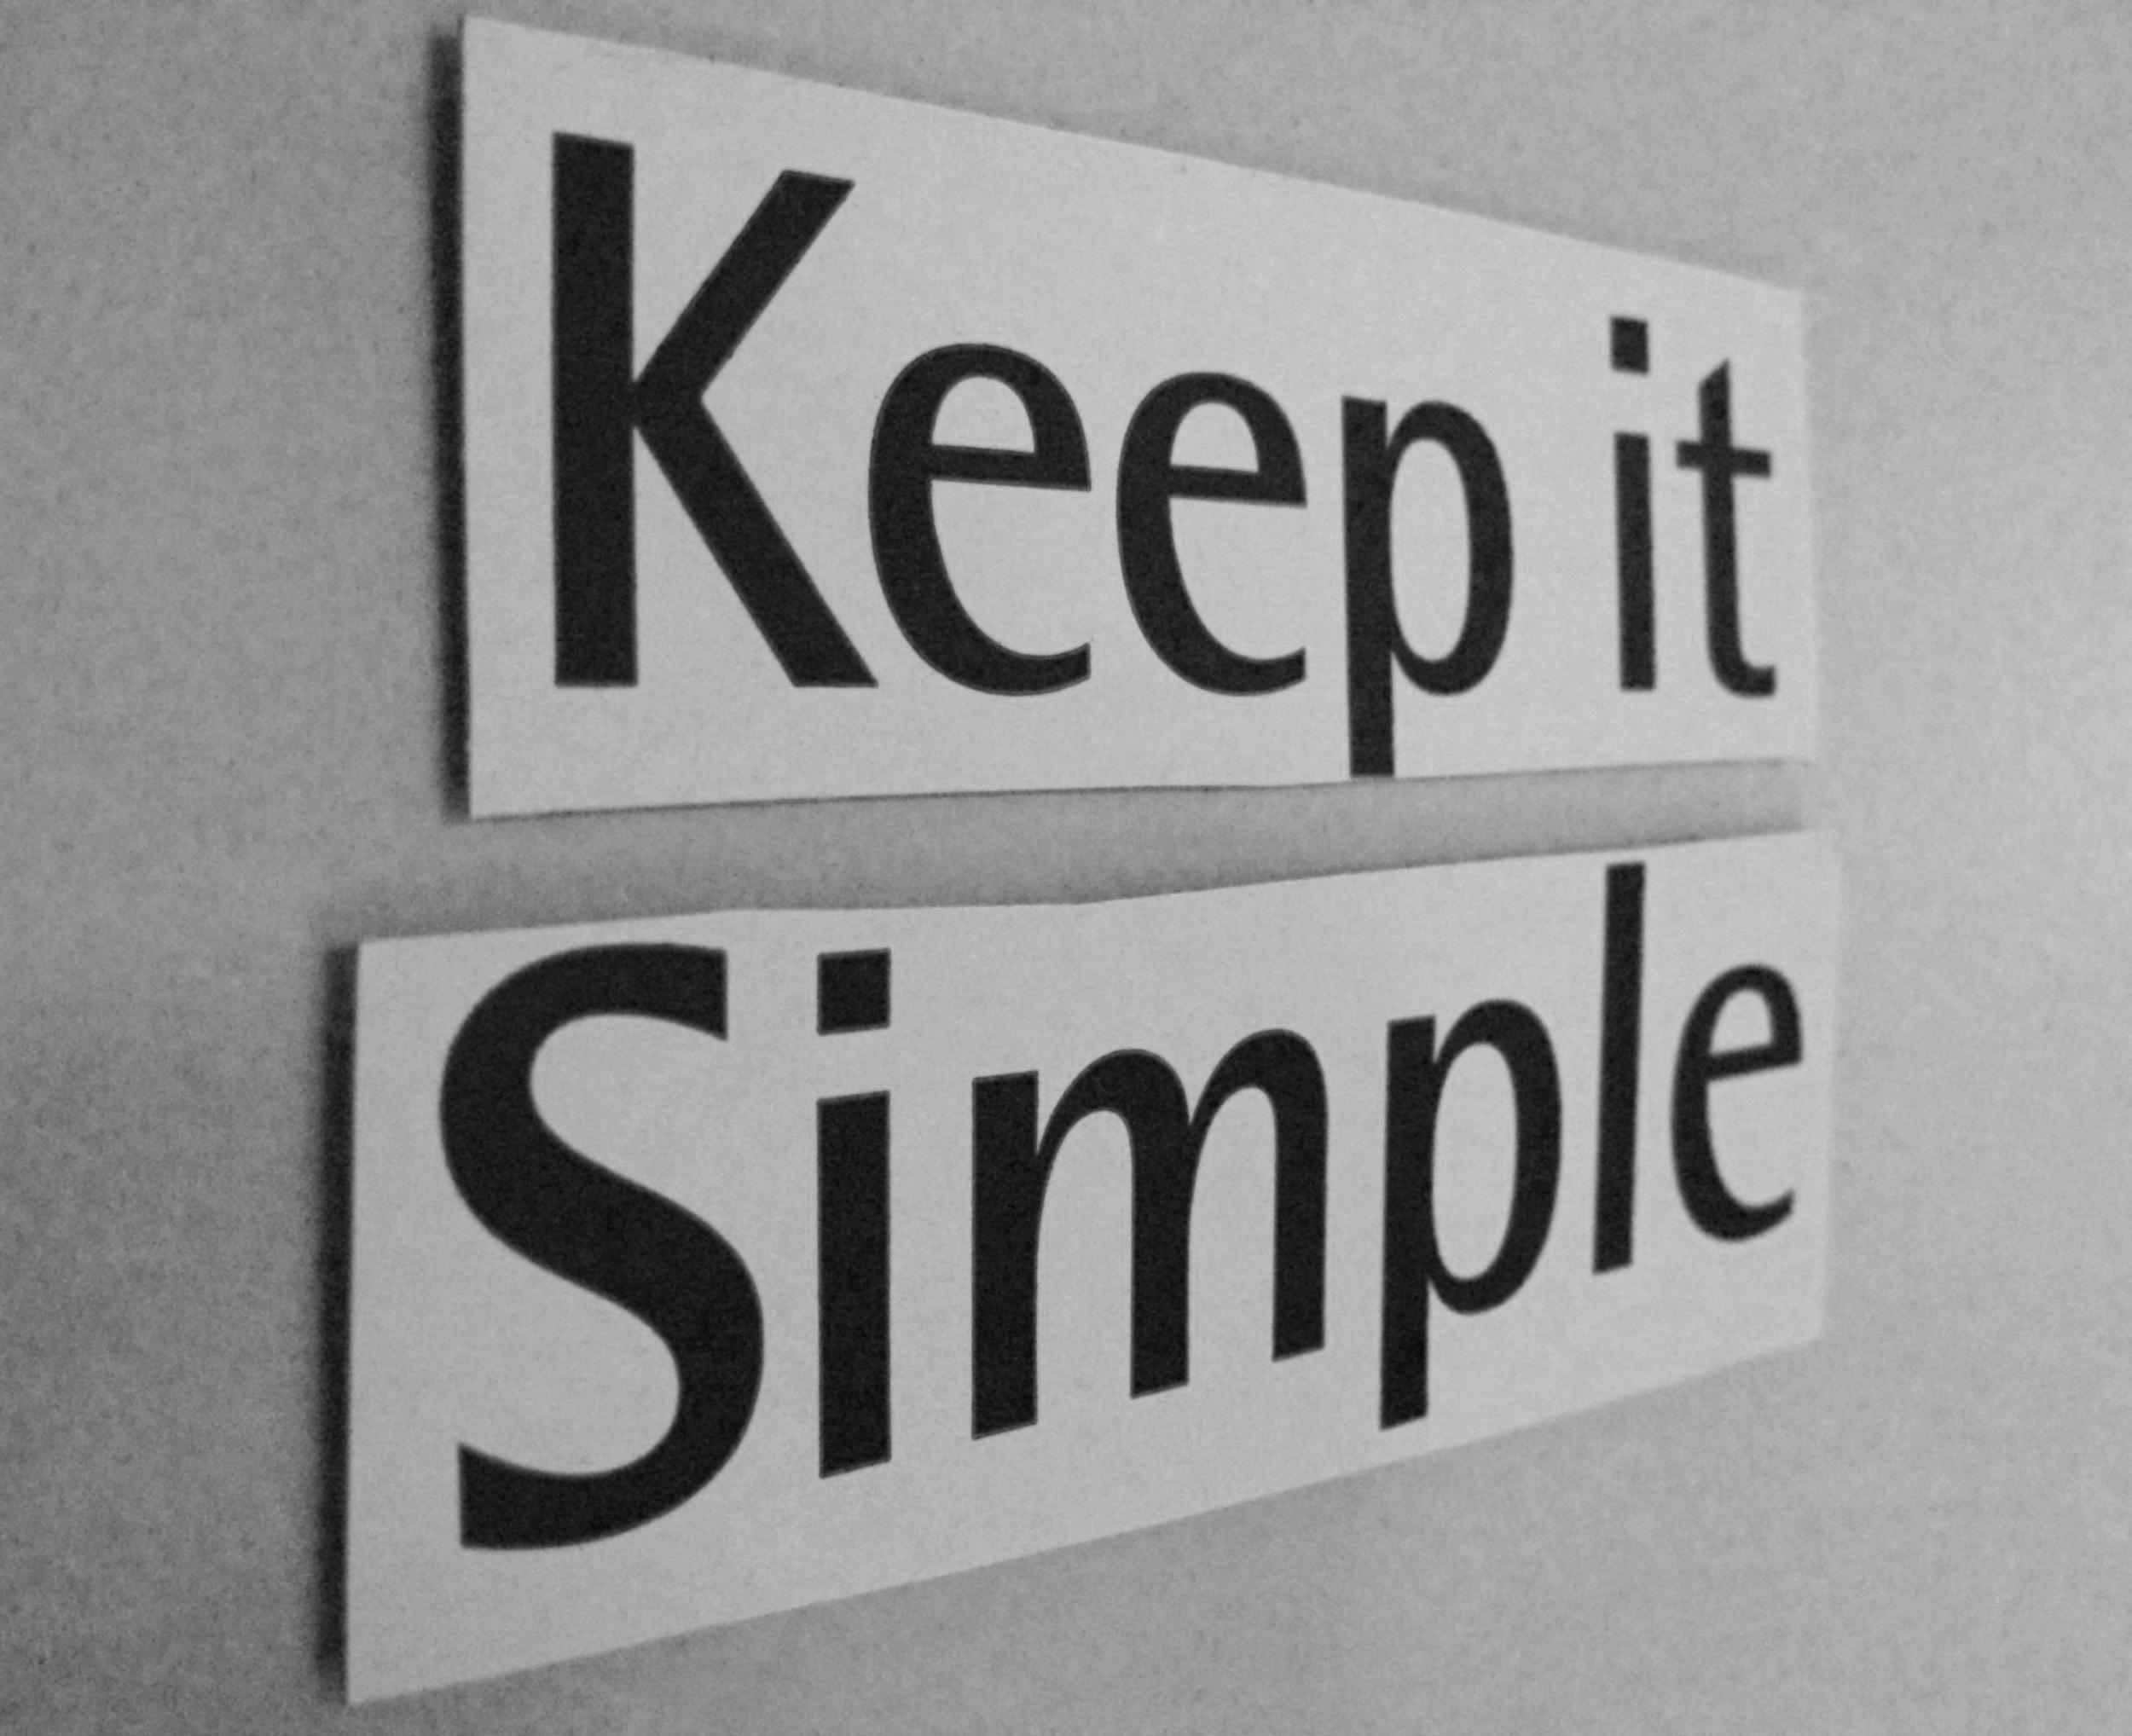 Keep It Simple by Jimee, Jackie, Tom & Asha, CC2.0